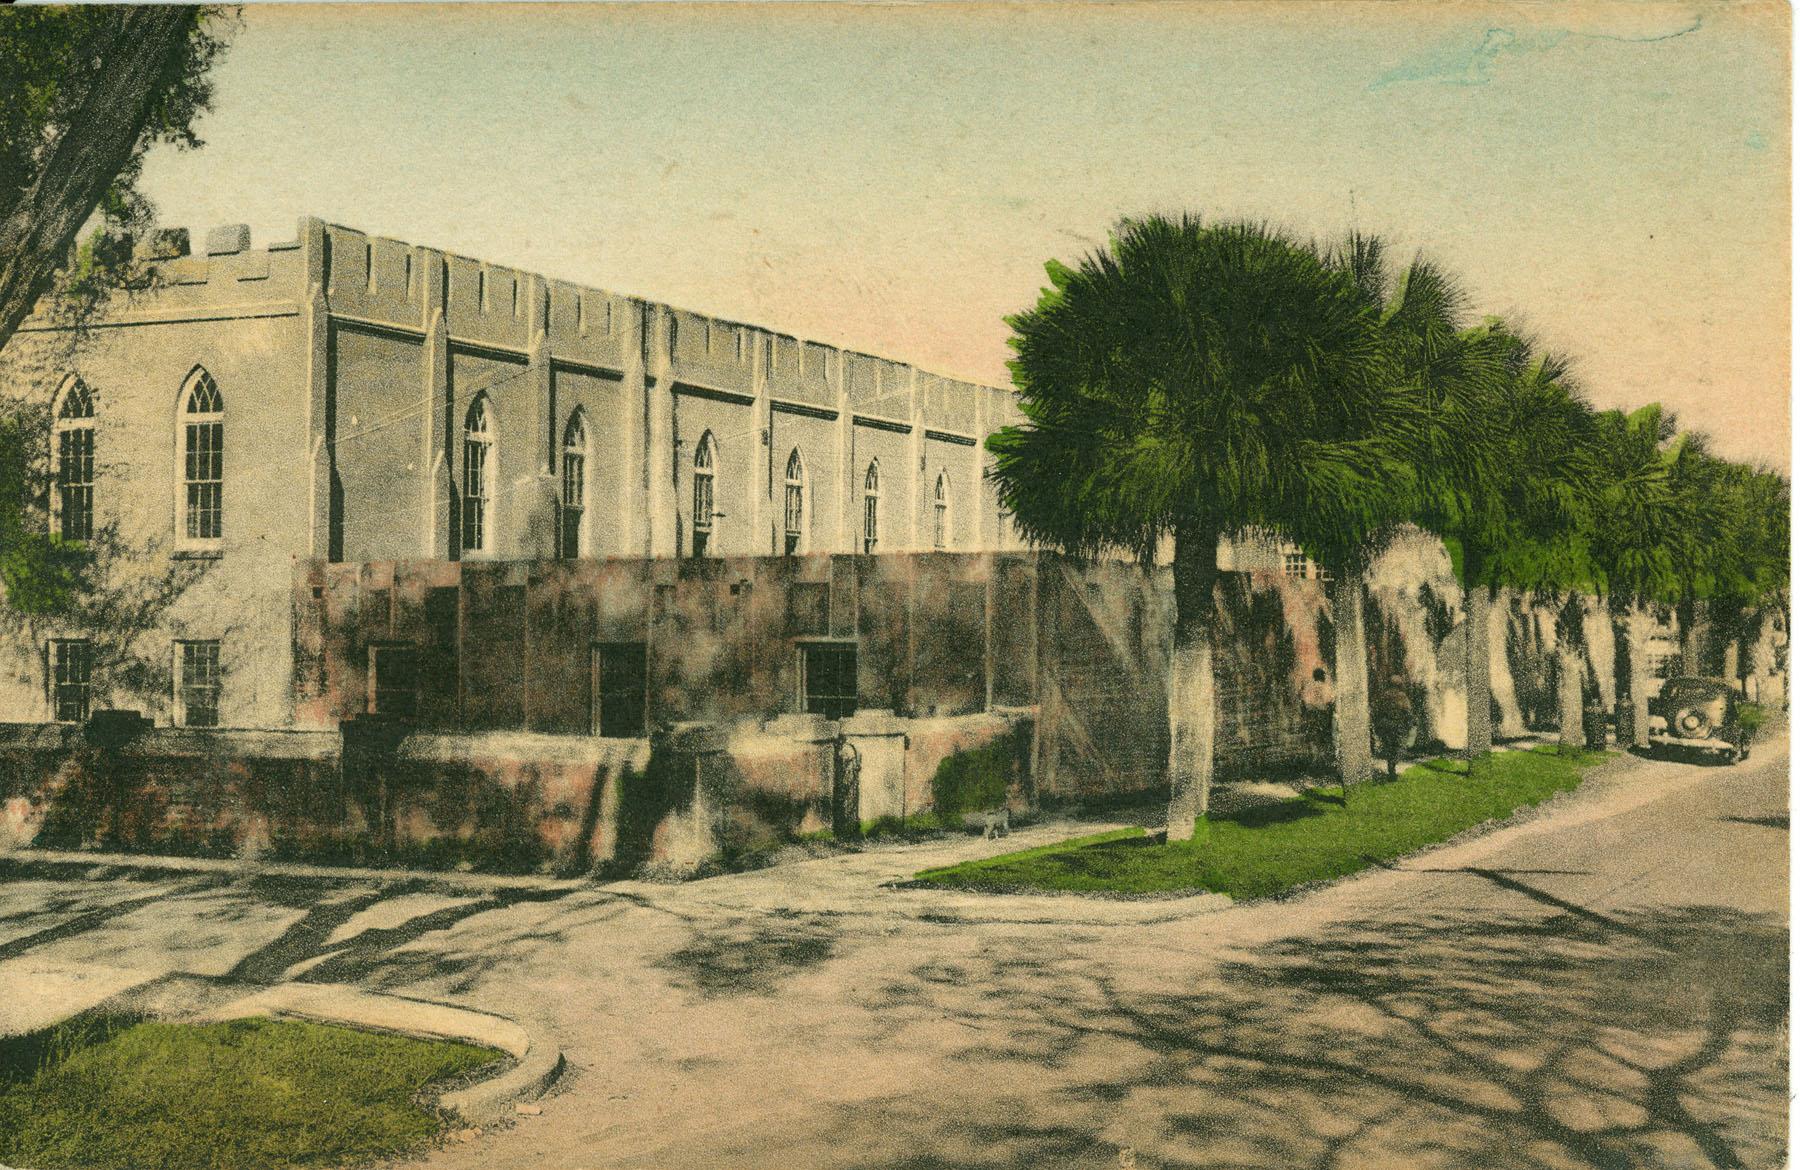 The Old Arsenal, Beaufort, South Carolina.